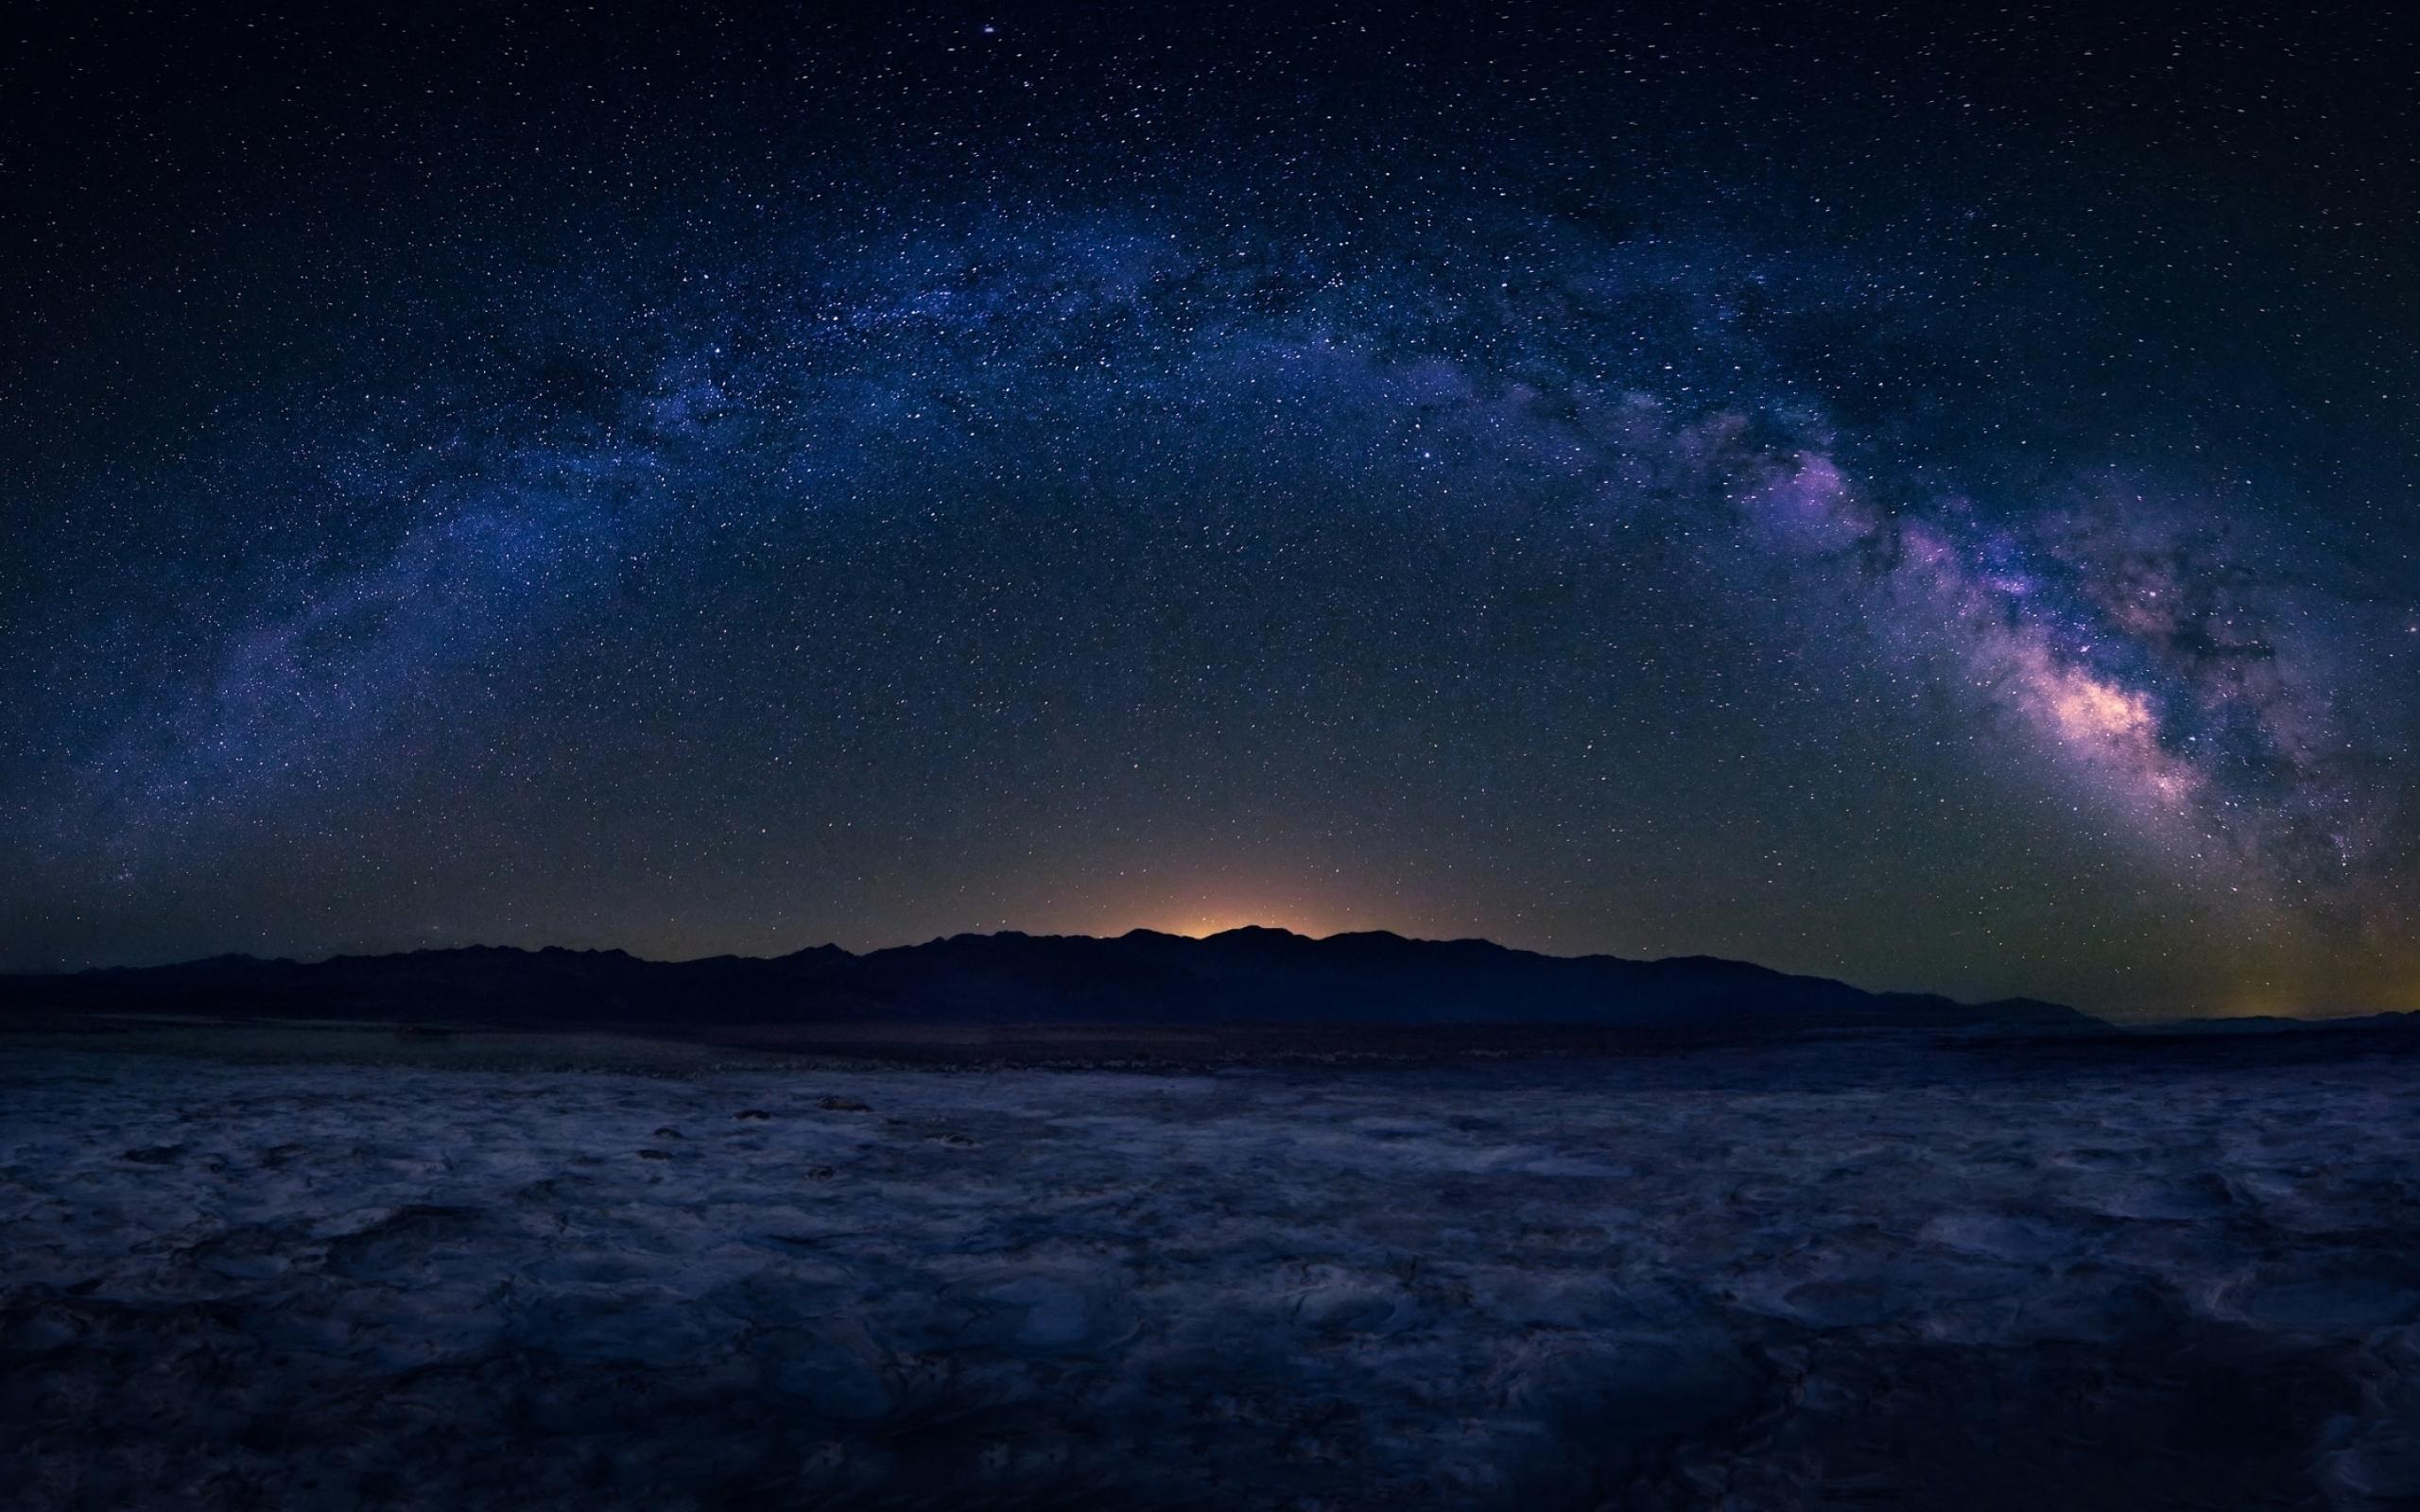 2560x1600 Milky Way Starry Sky Landscape 2560x1600 ...